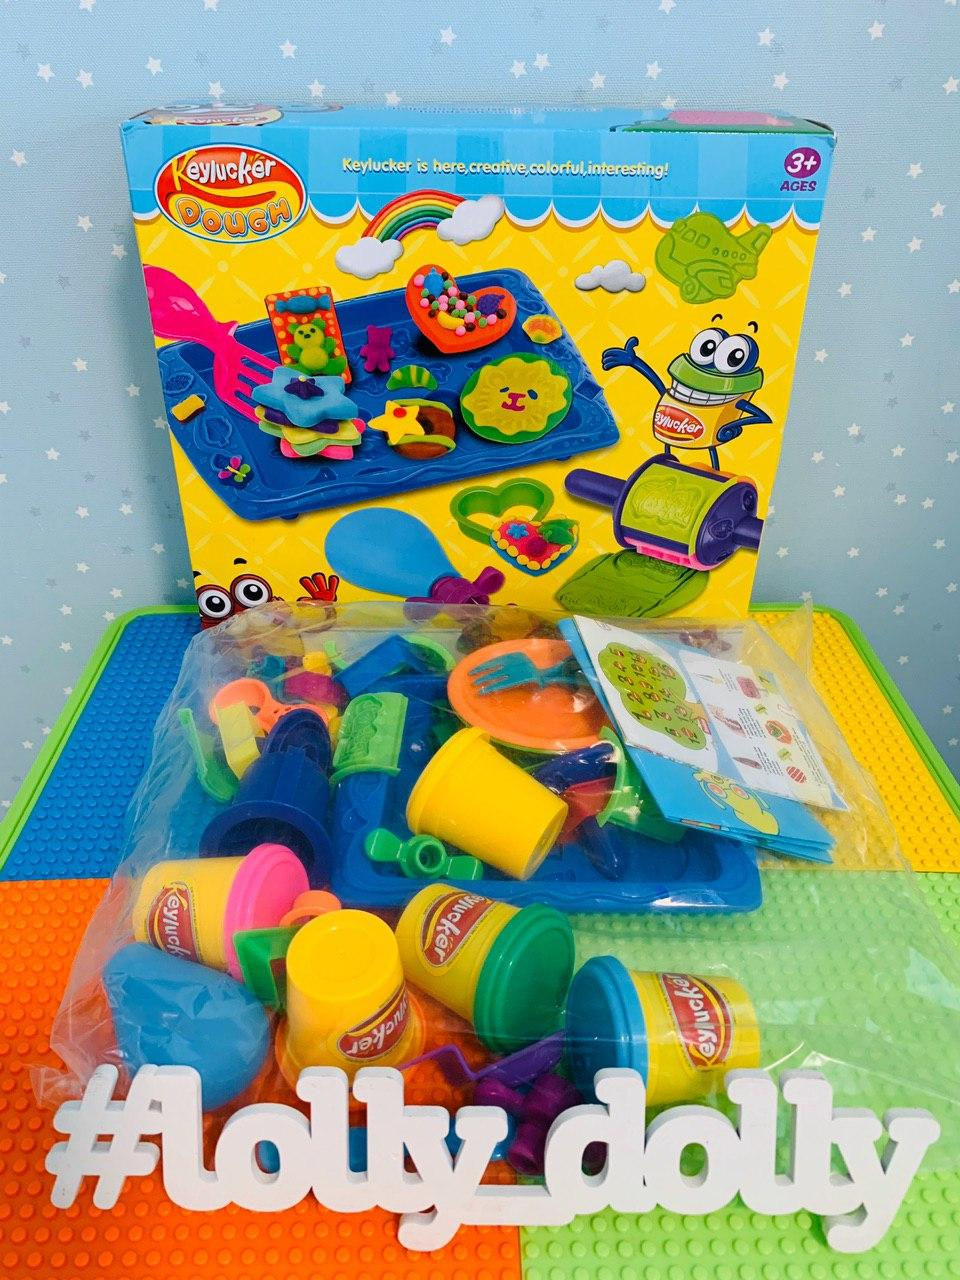 Тесто для лепки КА 1503 аналог Магазинчик печенья Play Doh